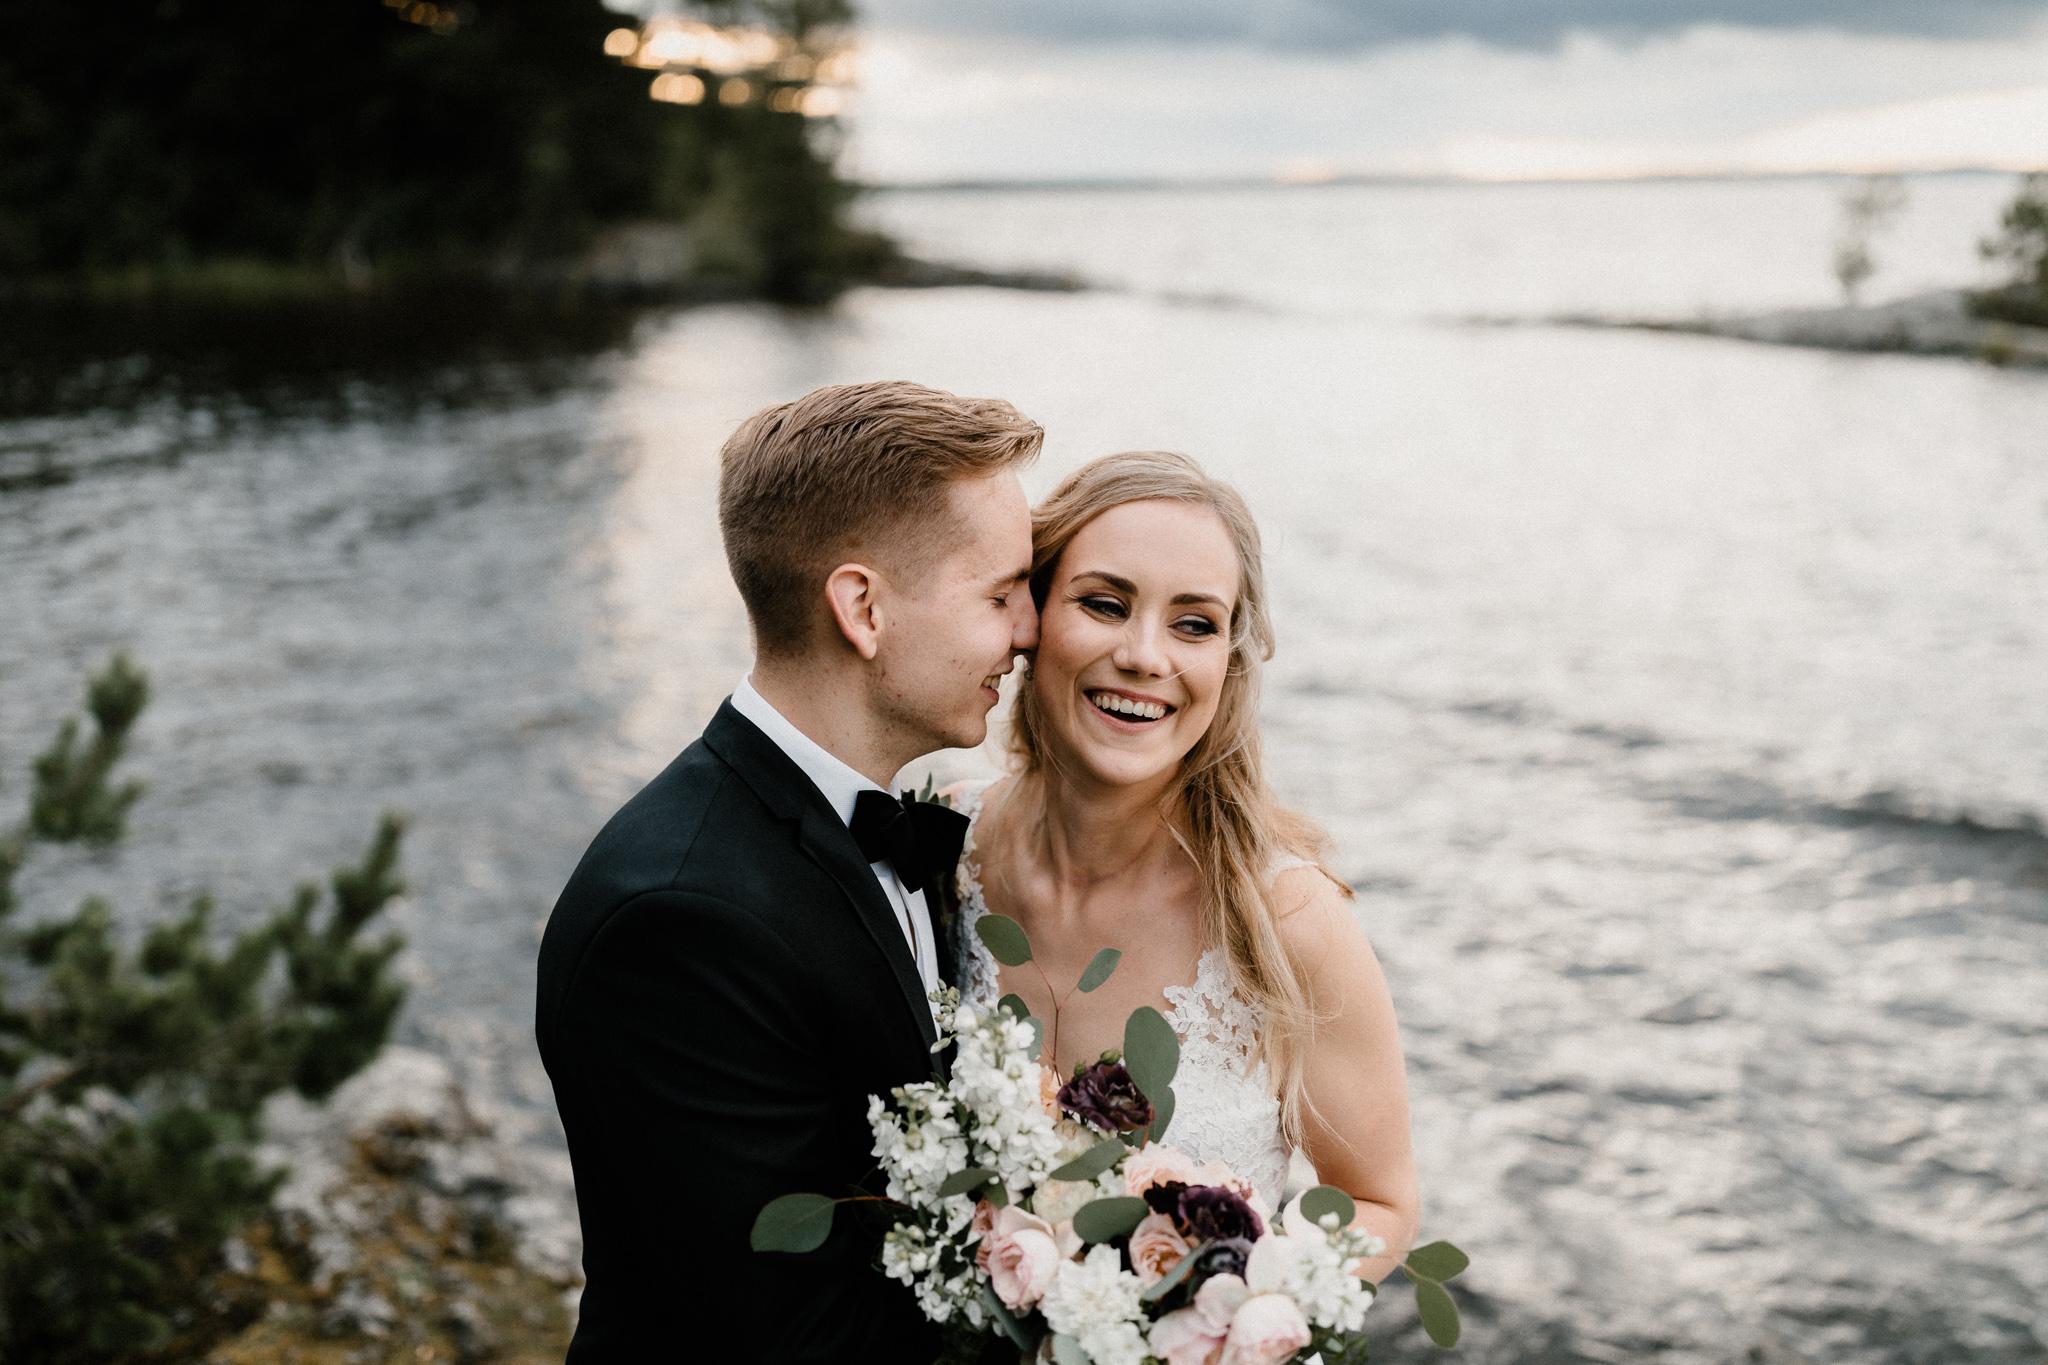 Johanna + Mikko - Tampere - Photo by Patrick Karkkolainen Wedding Photographer-126.jpg